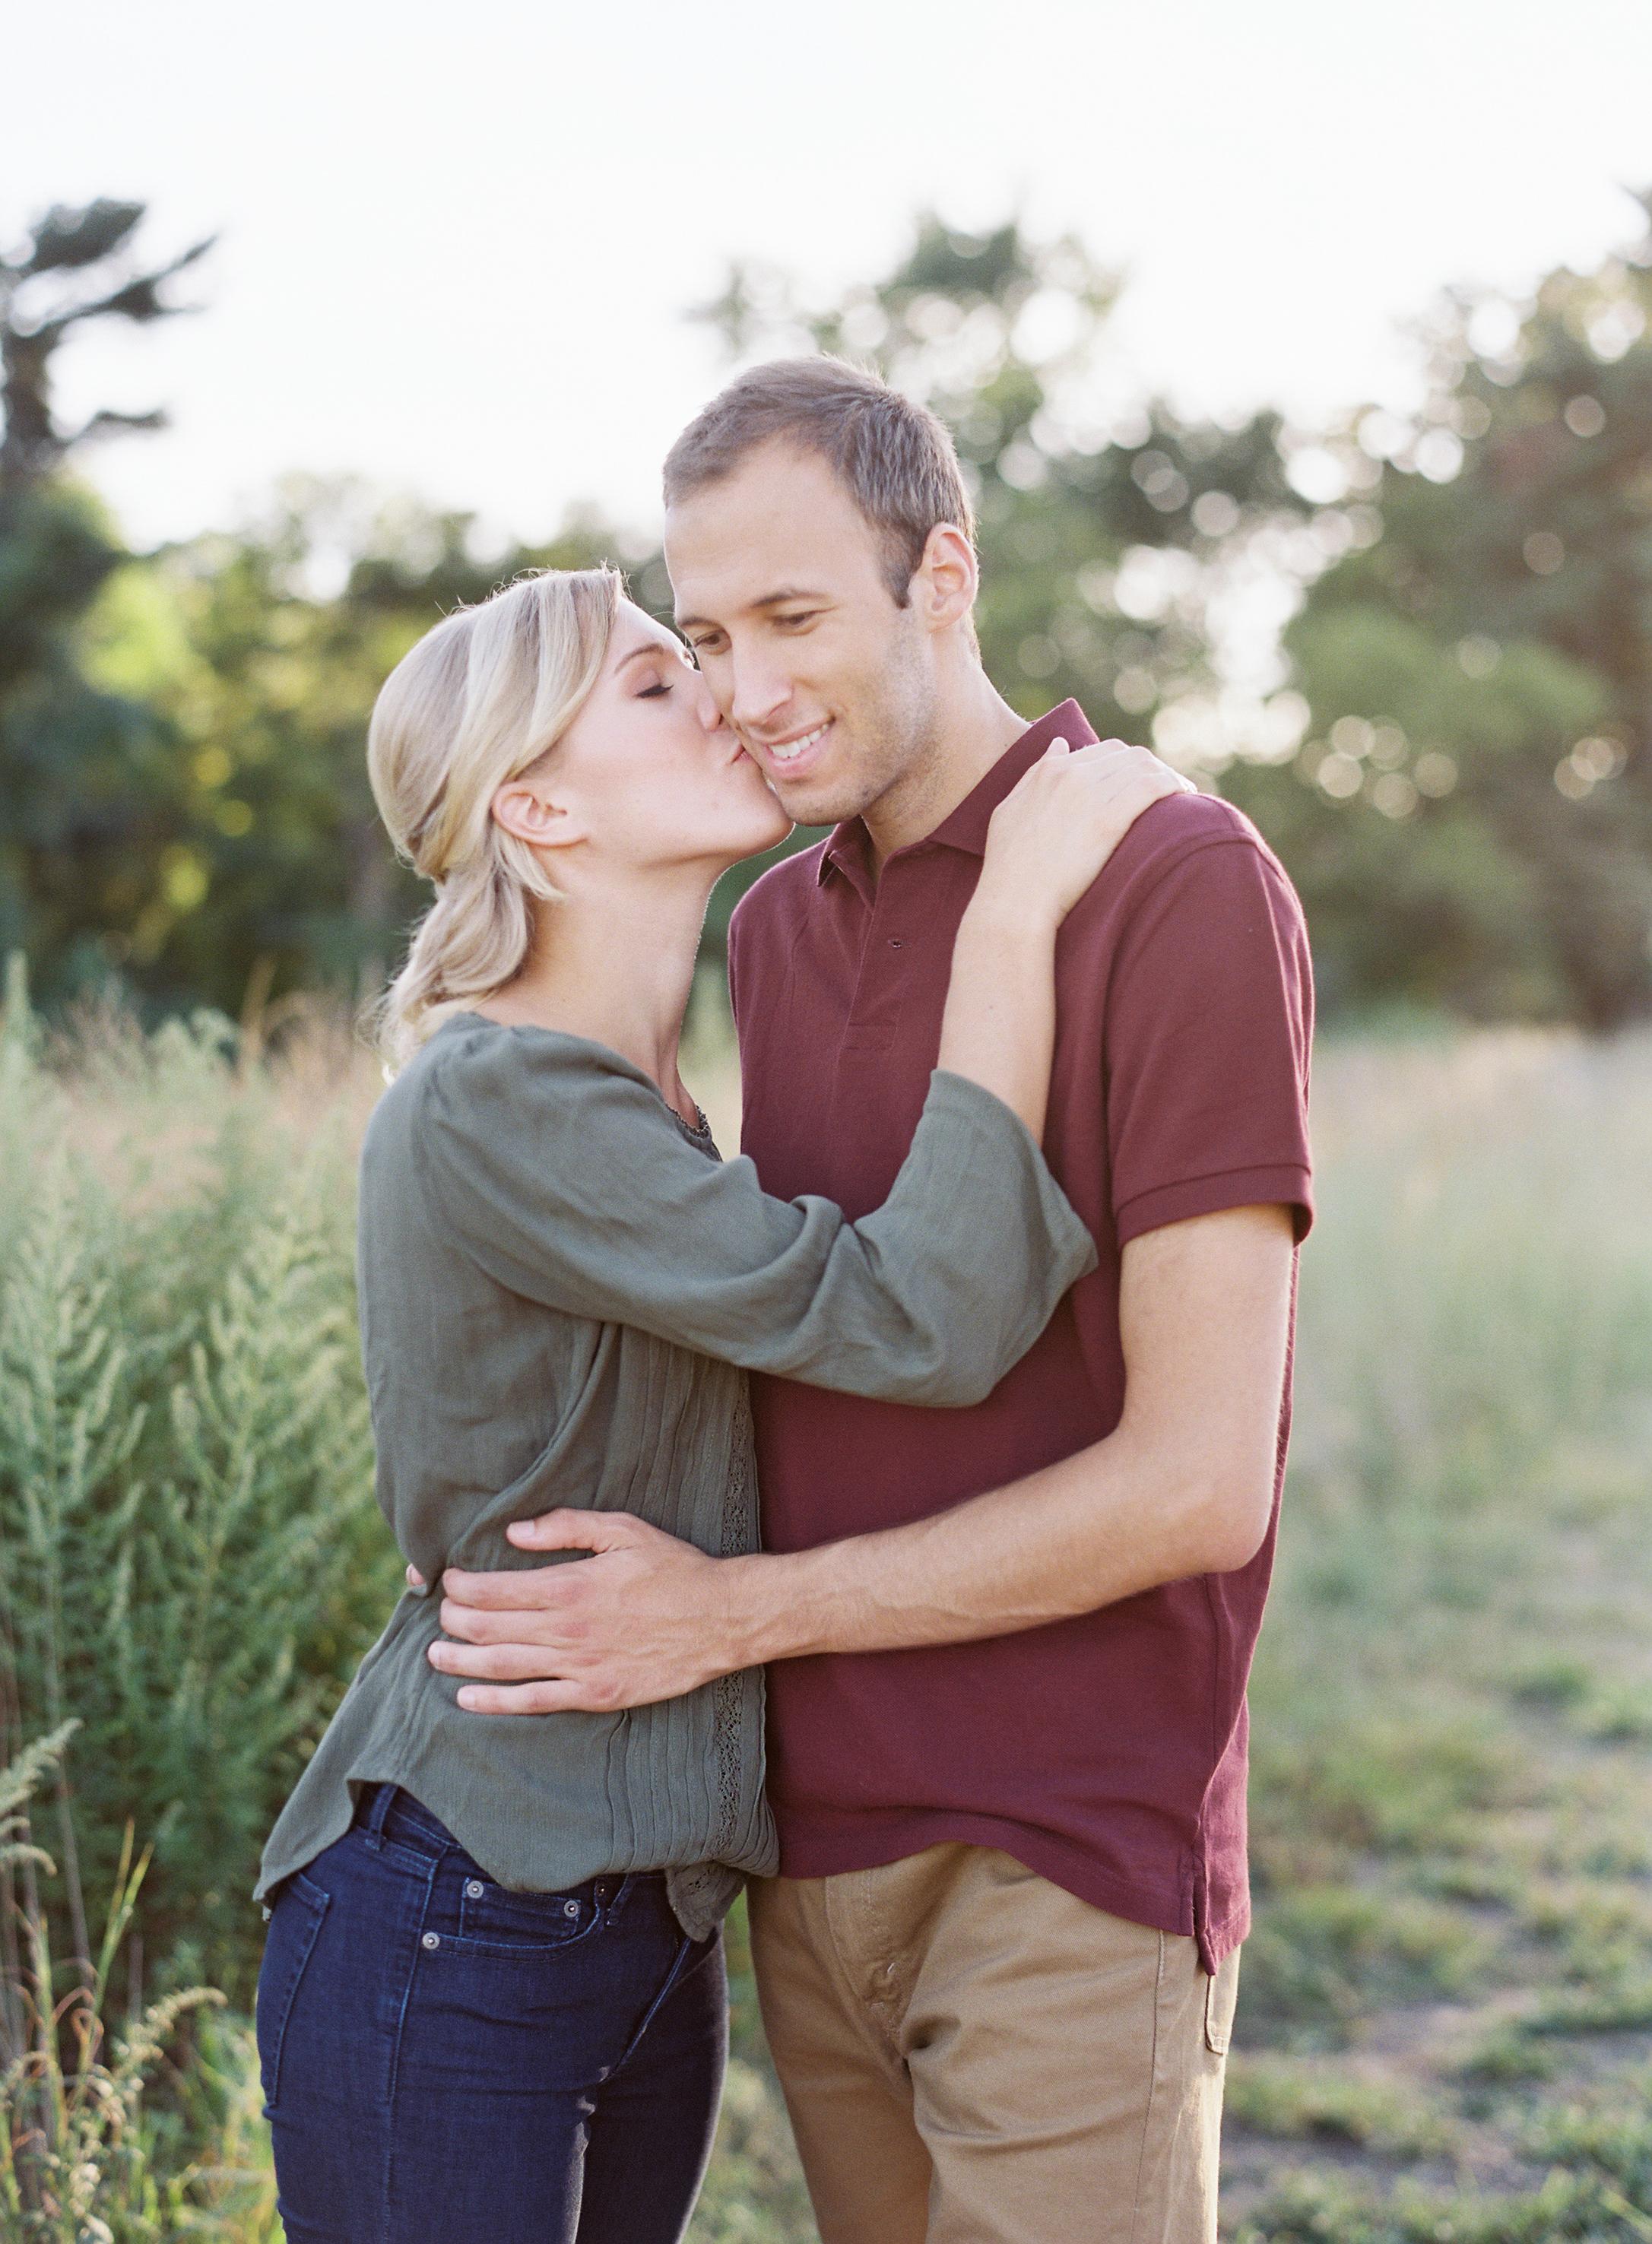 Meghan Mehan Photography | Fine Art Film Wedding Photographer | California | San Francisco | Napa | Sonoma | Santa Barbara | Big Sur | Los Angeles | Destination Wedding Photographer 031.jpg